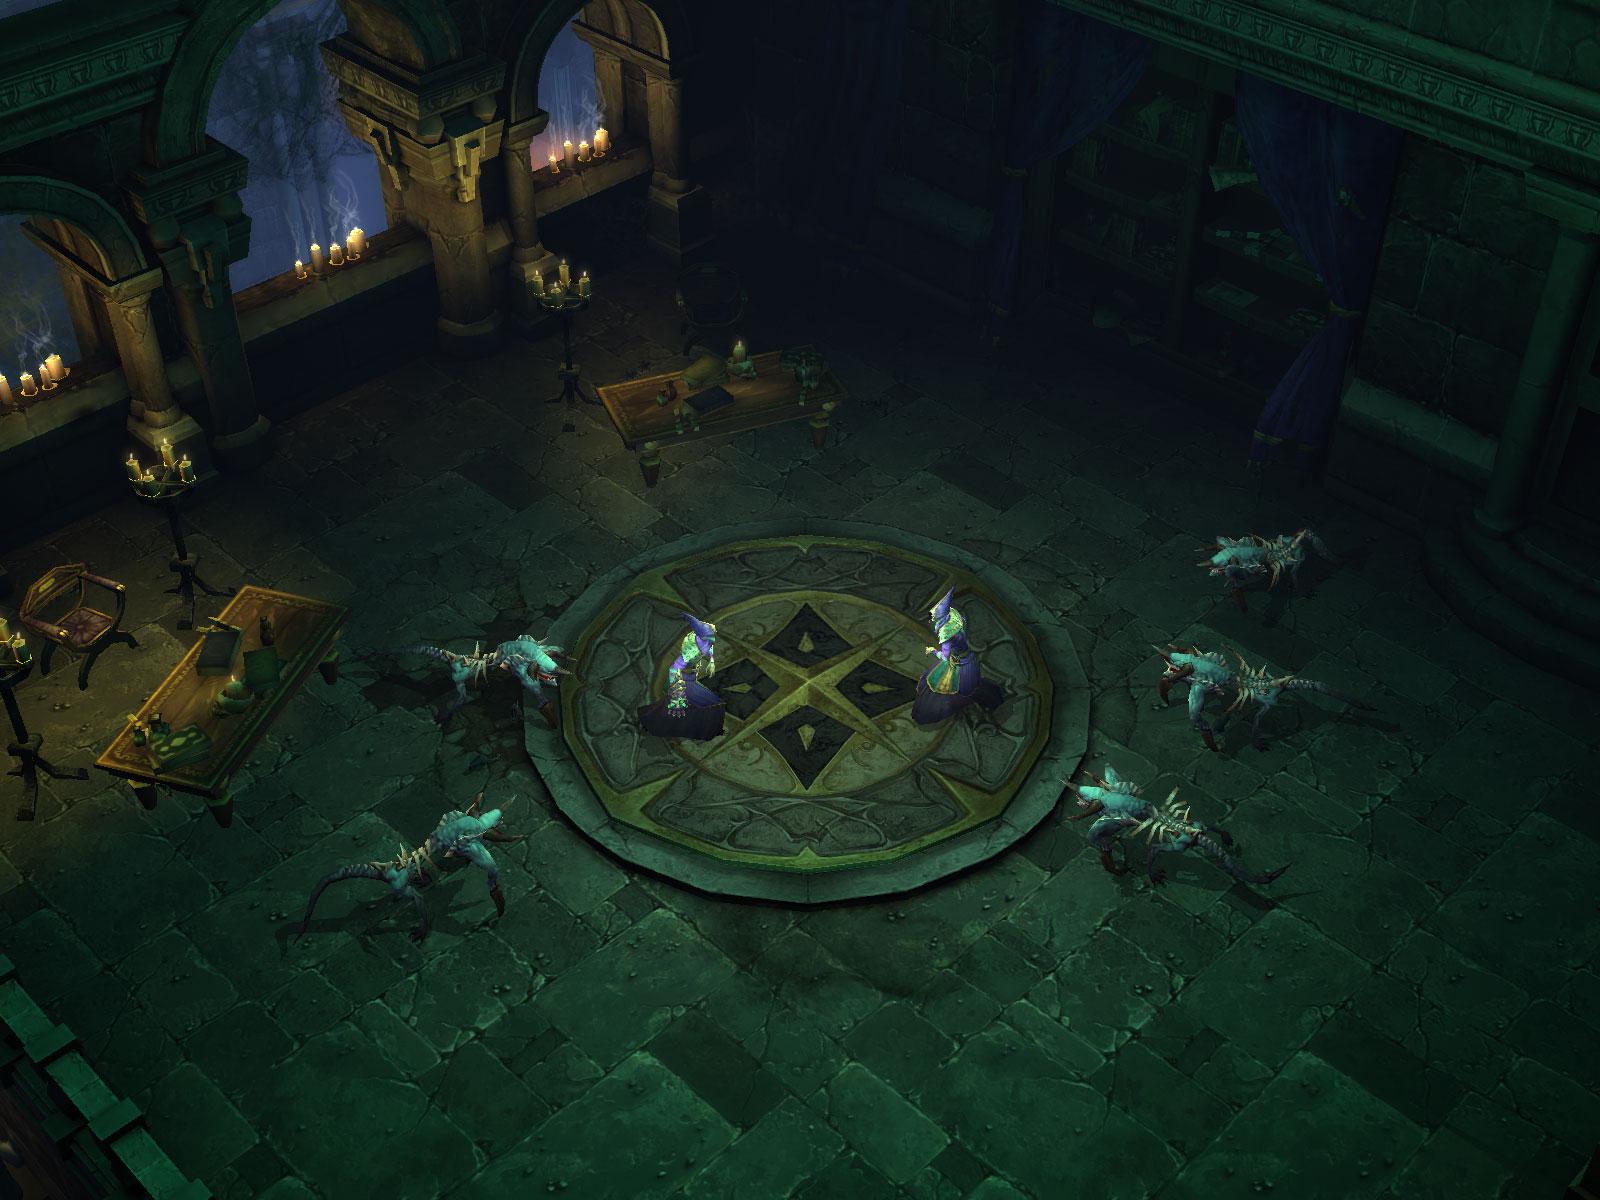 Blizzard kündigt Diablo 3 an - Diablo 3